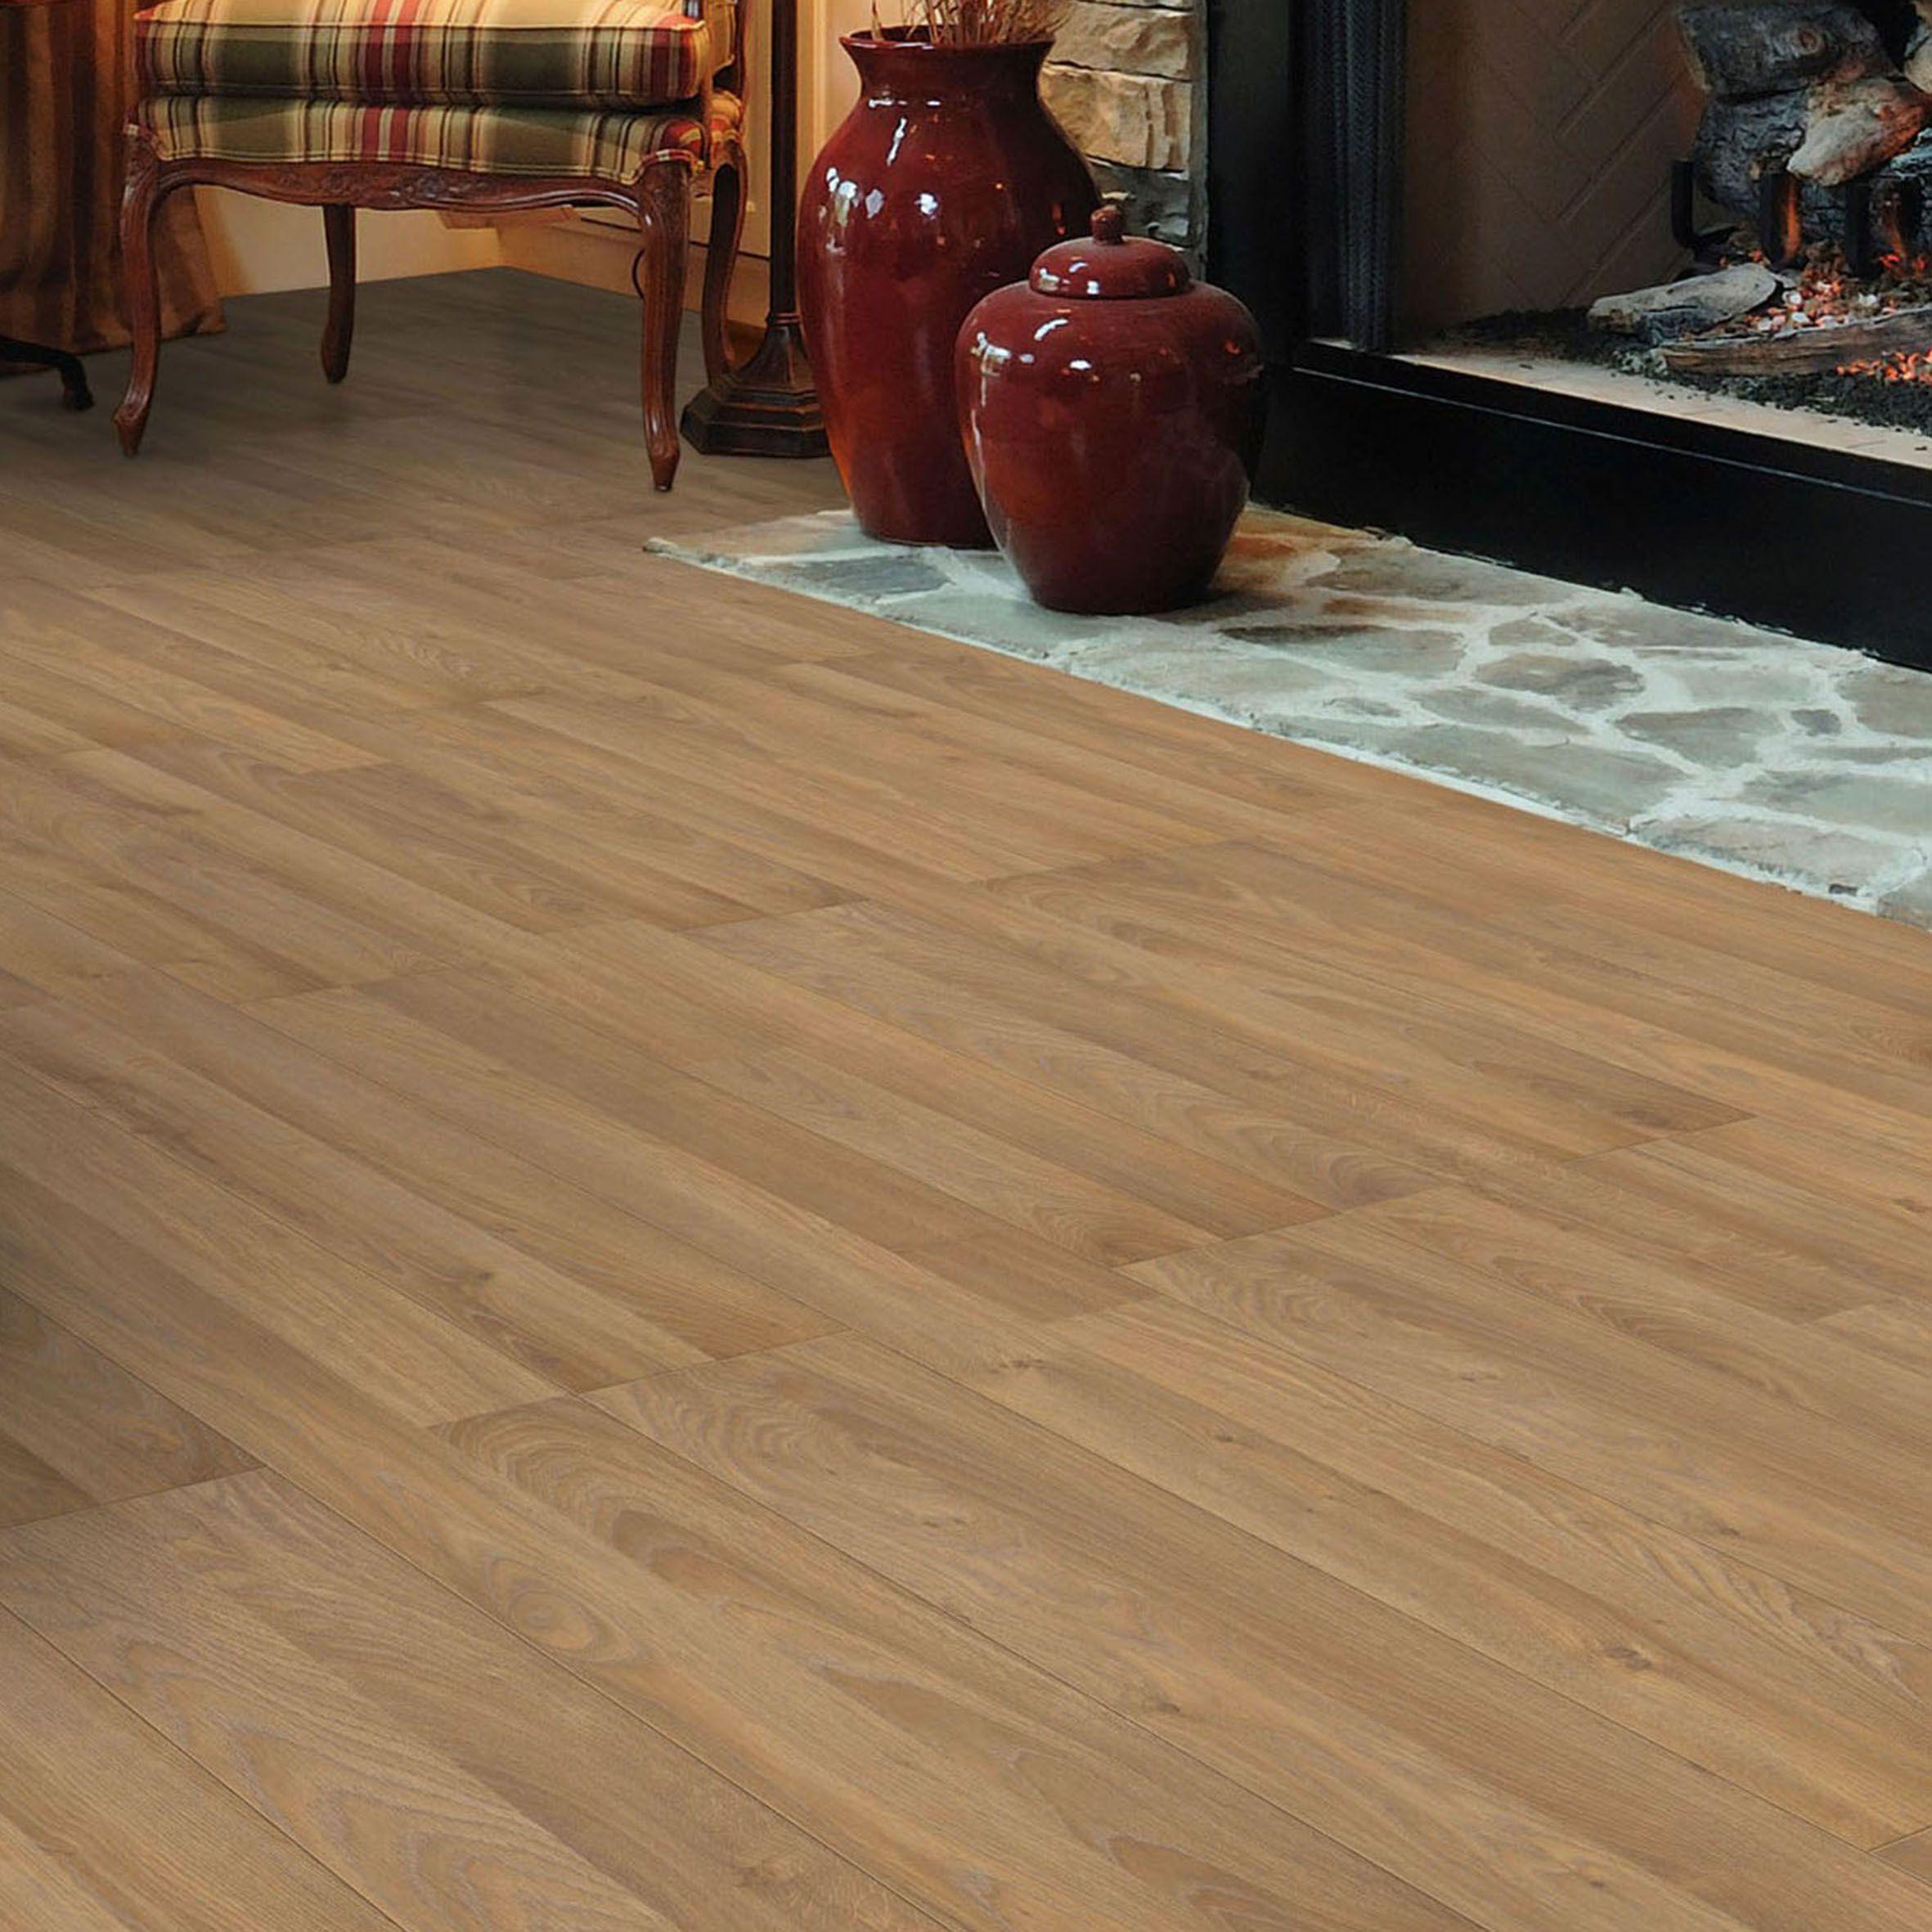 Golden oak effect laminate flooring sample departments for B q laminate flooring